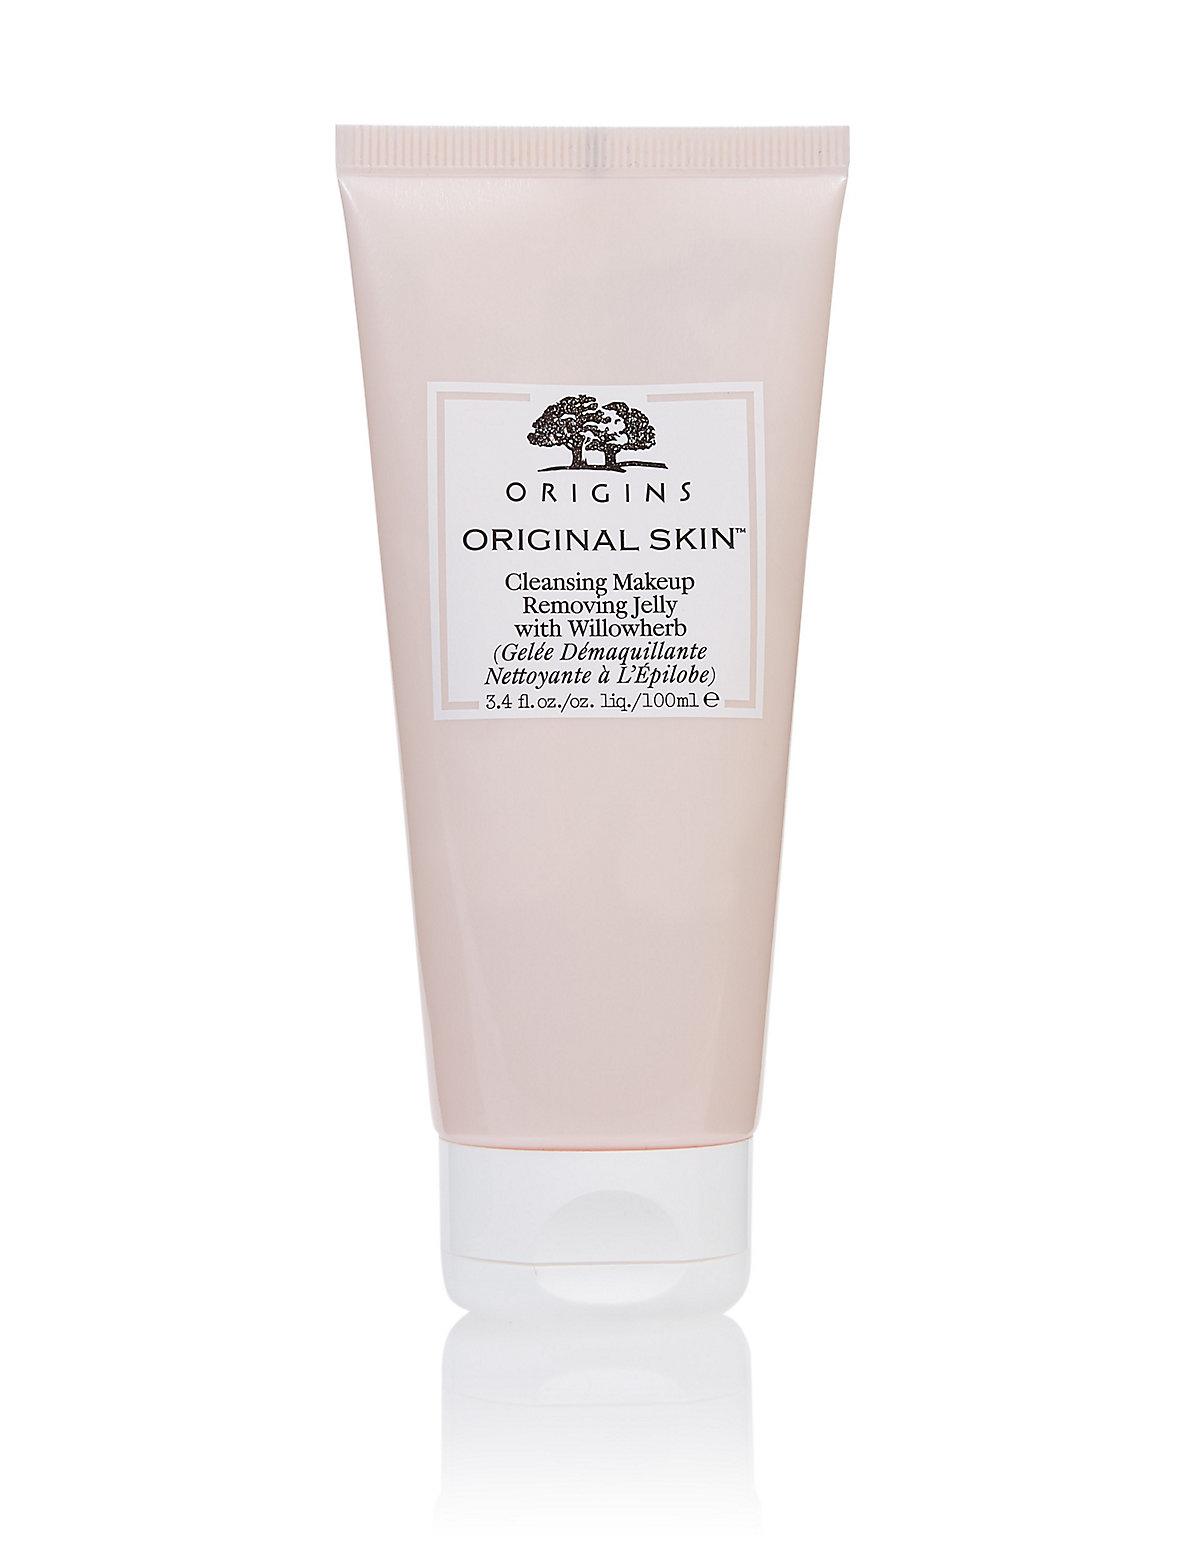 Origins Original Skin Cleansing Makeup Removing with Willowherb 100ml